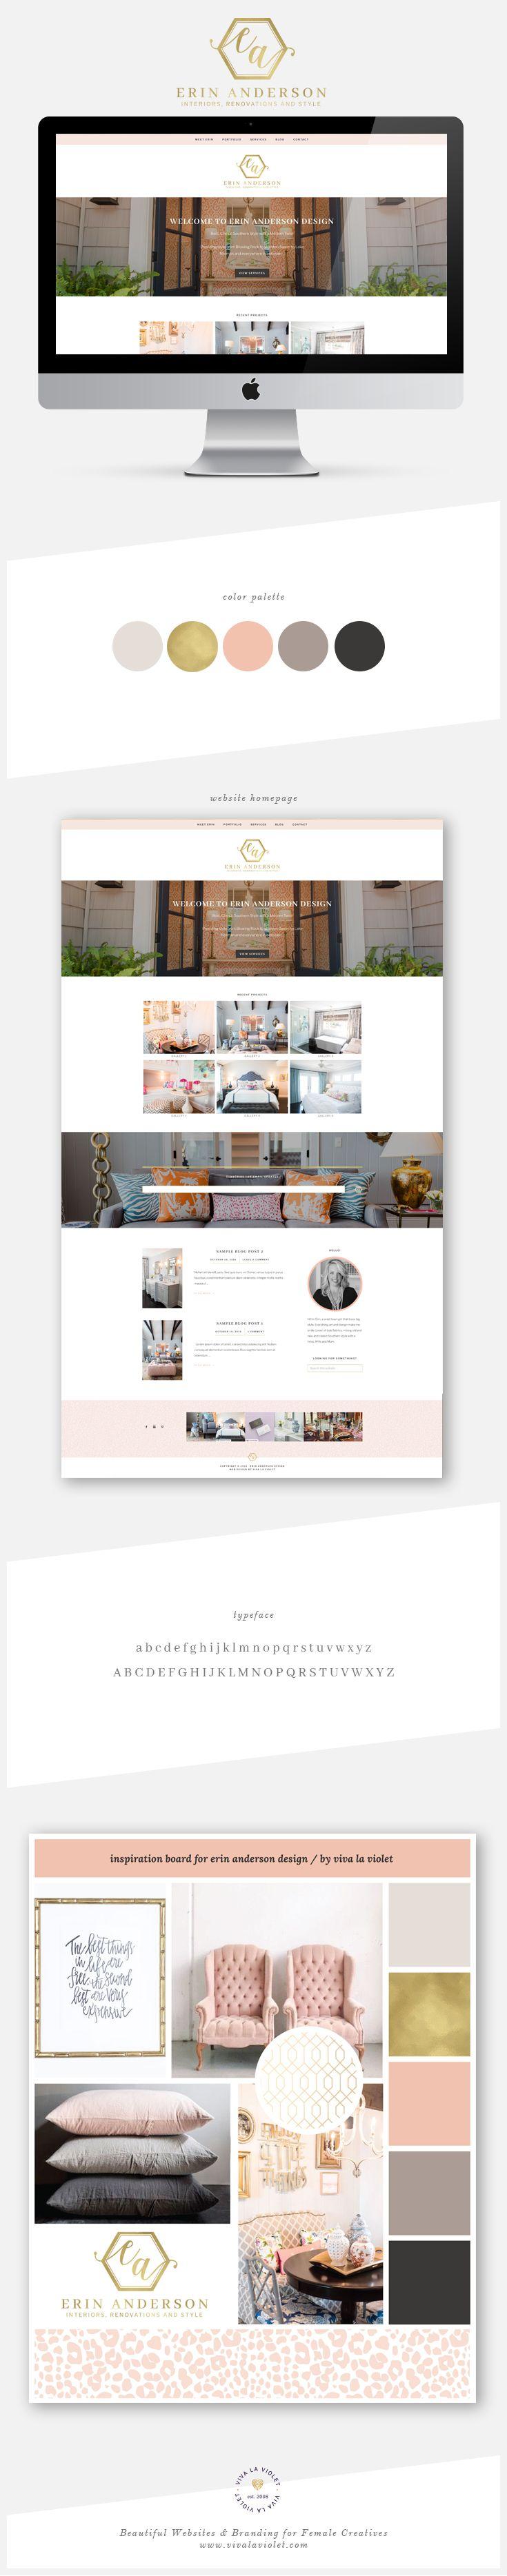 Beautiful Web Designs and Branding for Female Creatives by Viva la Violet | Erin Anderson Design